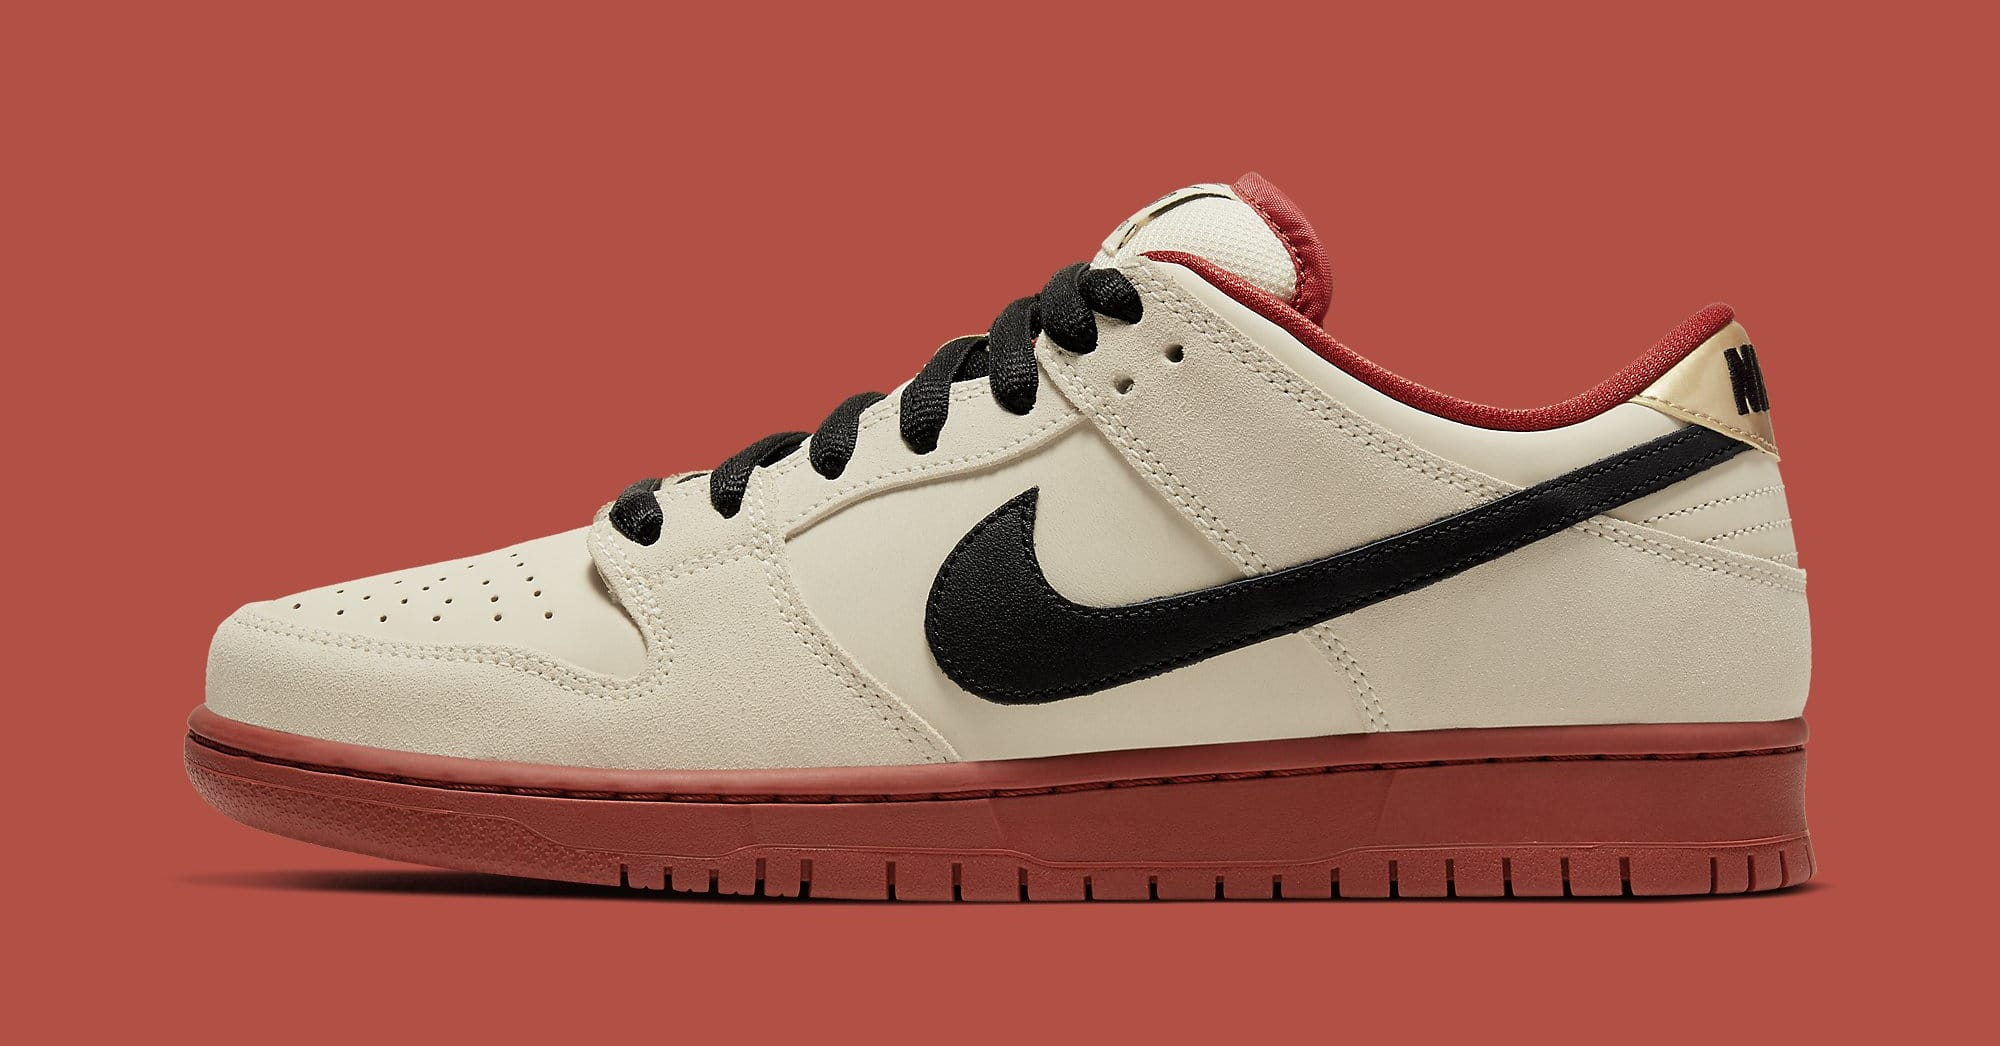 Nike SB Dunk Low 'Muslin' BQ6817-100 Lateral